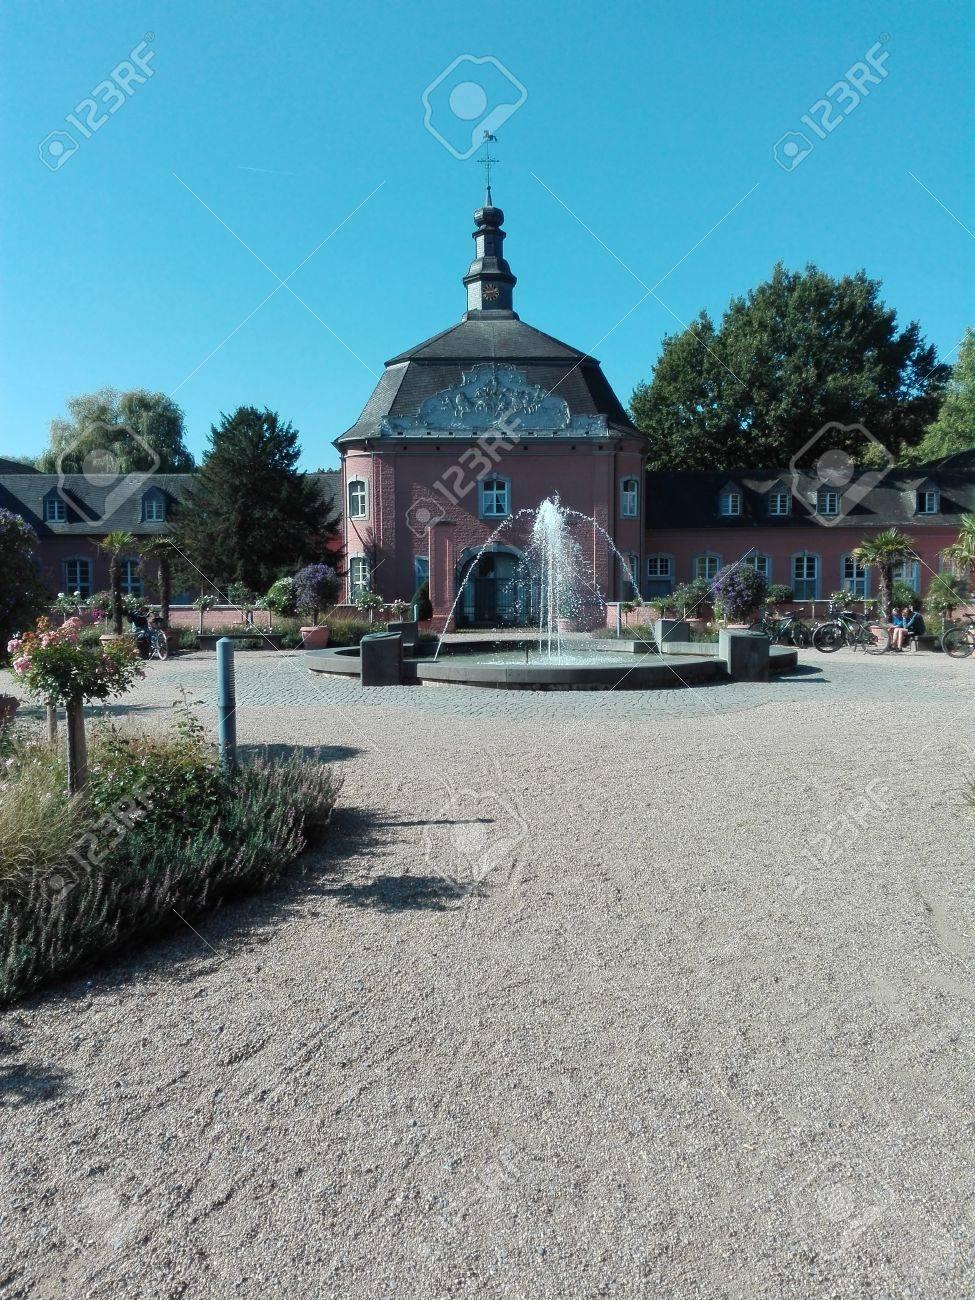 Castle Wickrath - Building of the castle of Castle Wickrath, Germany, Wickrath 10/12/2016 - 68769721